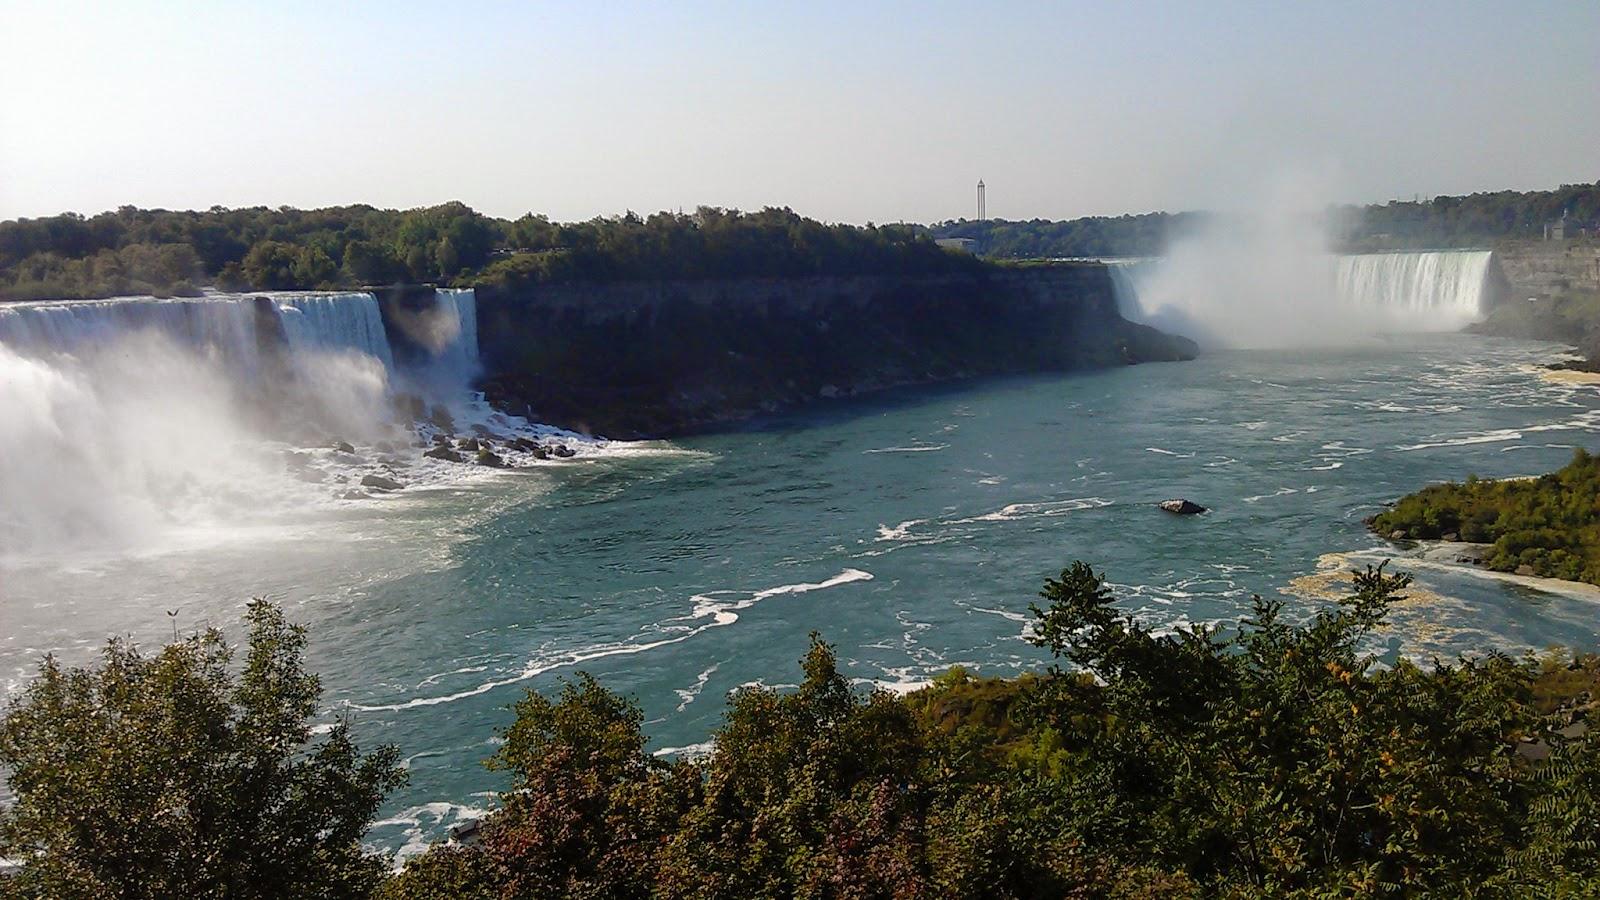 2012 Summer 美國加拿大東岸自駕行程∶尼加拉瀑布遊記 (Niagara falls)